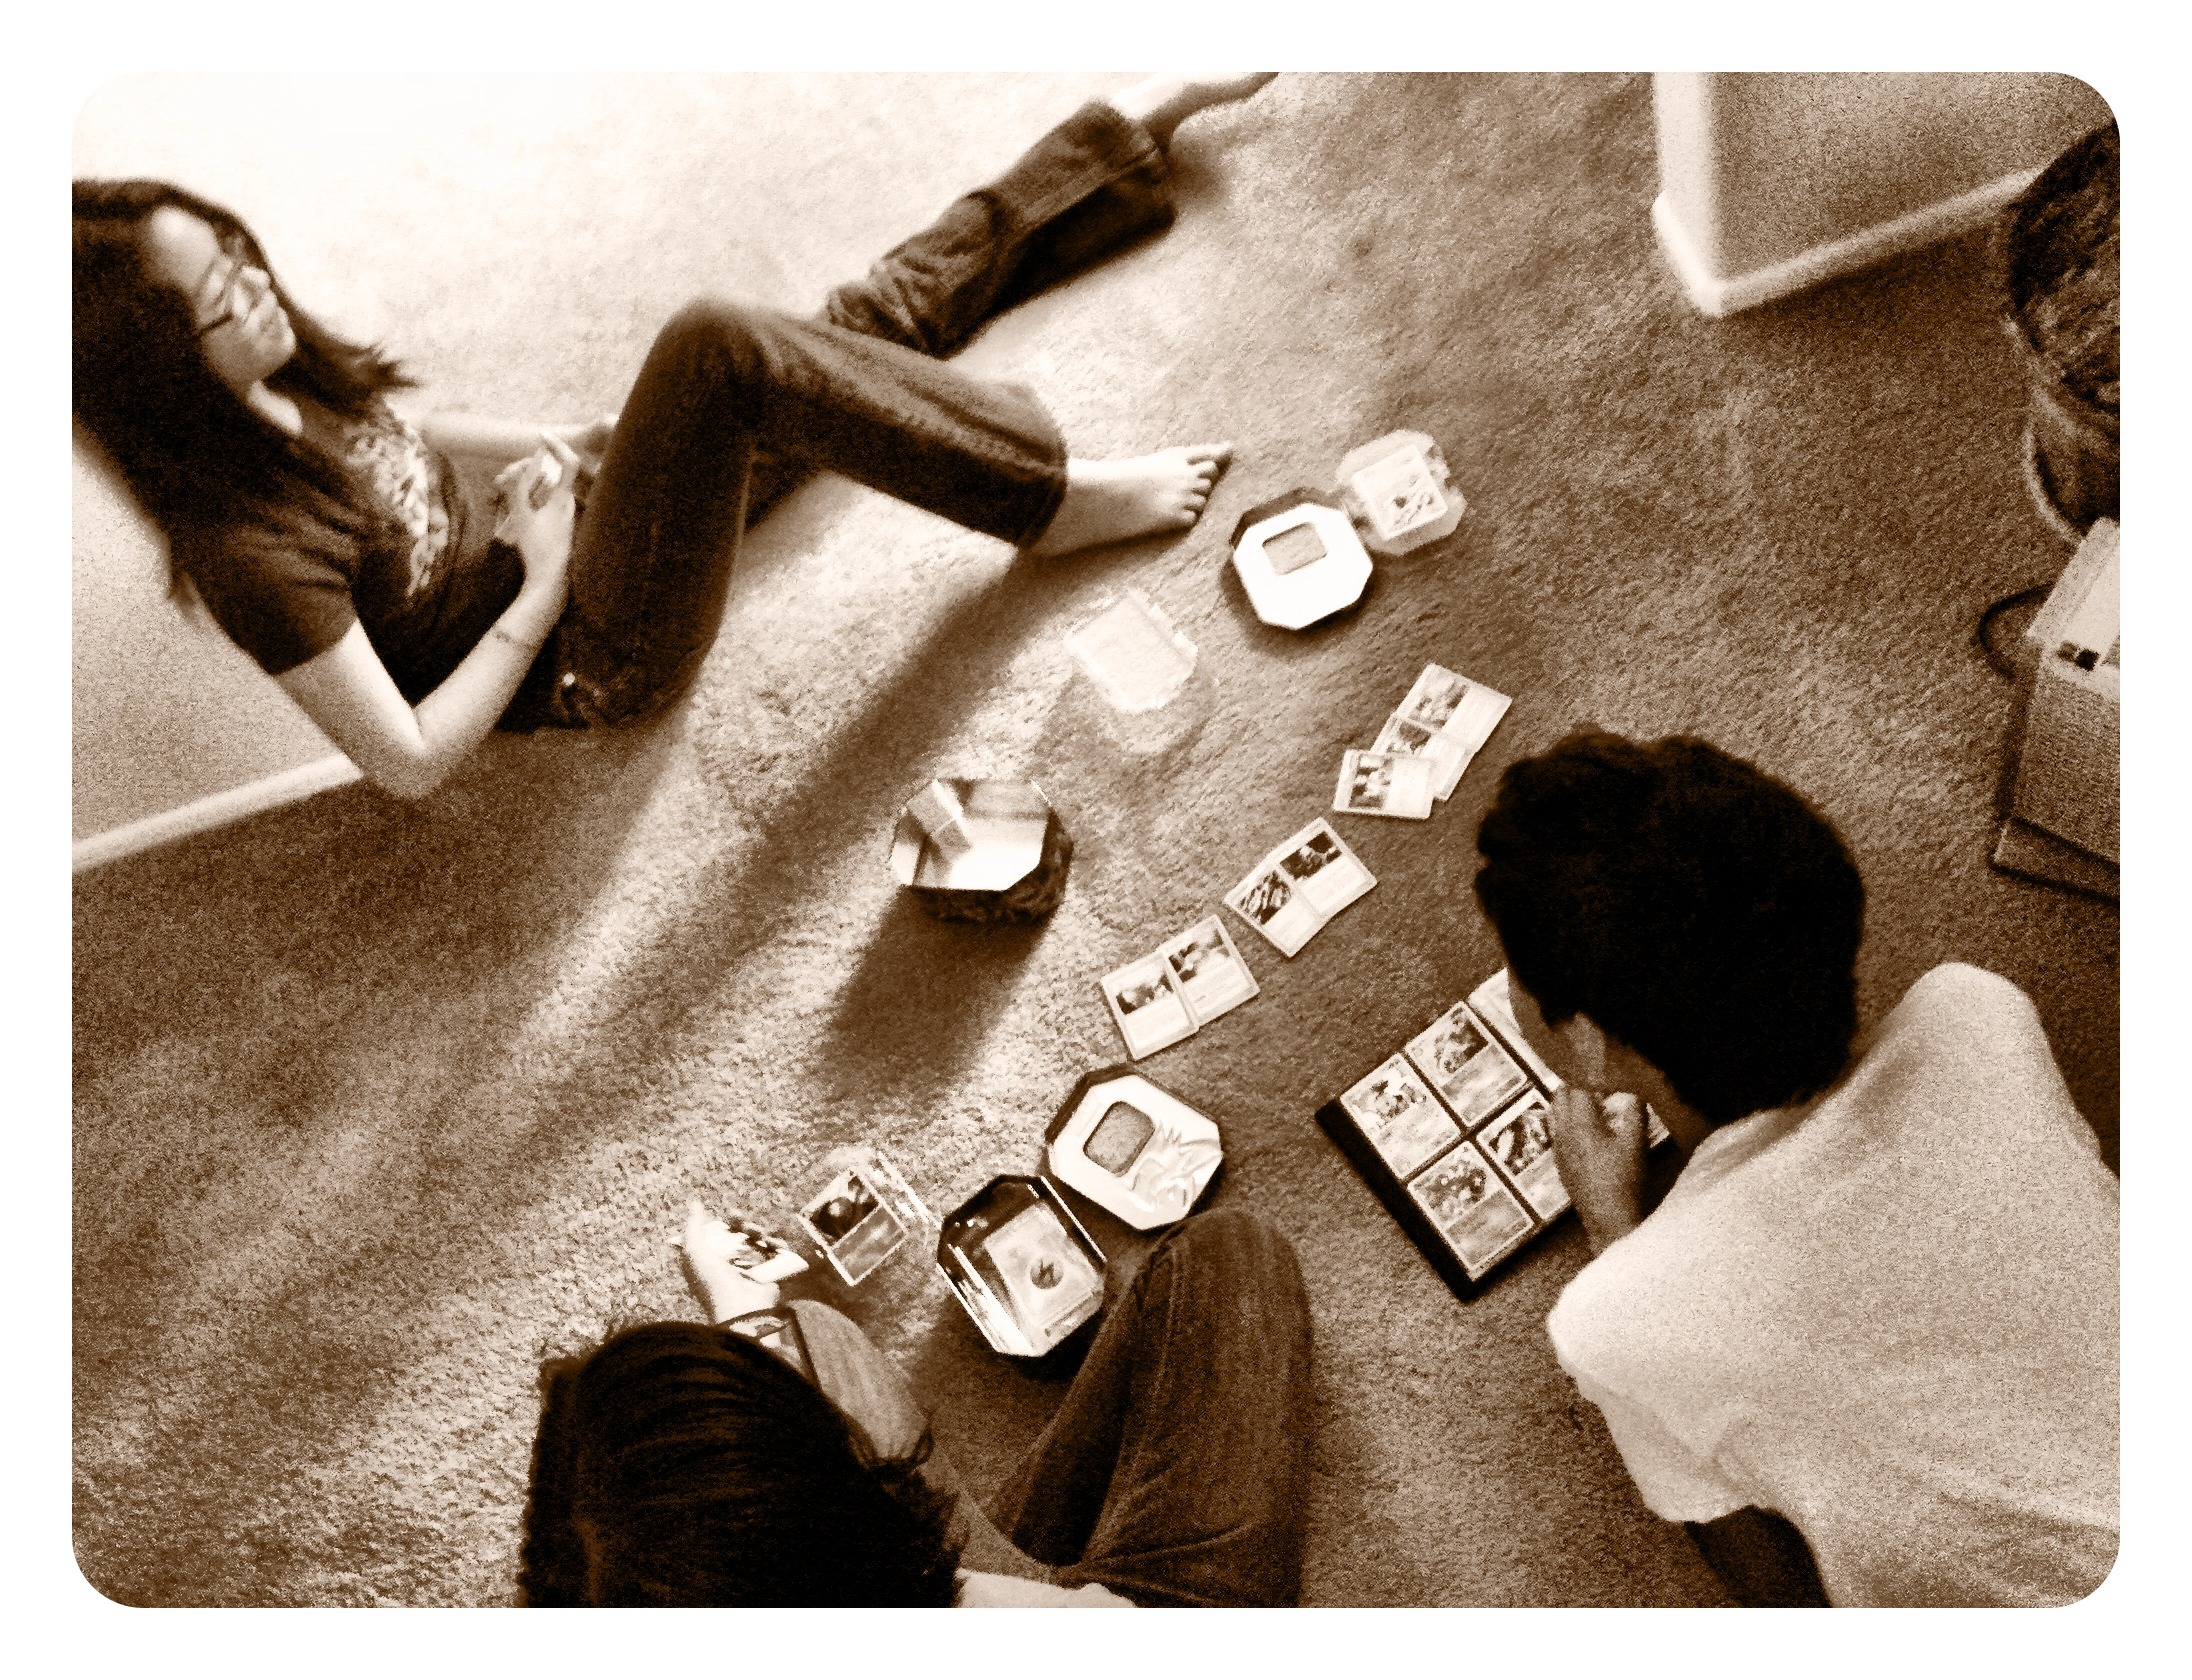 Kids trading Pokemon cards